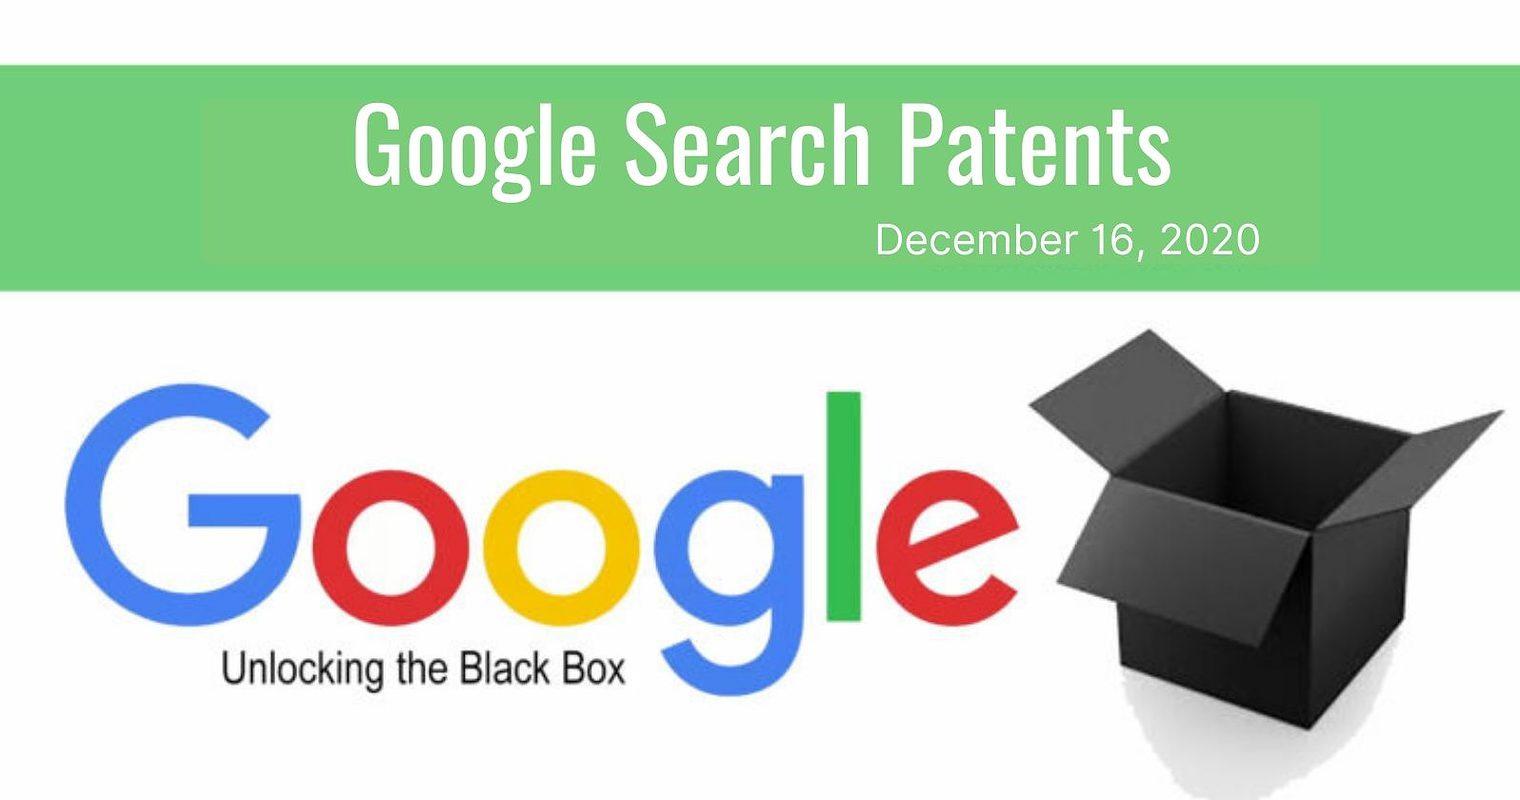 Google Search Patent Update – December 18, 2020